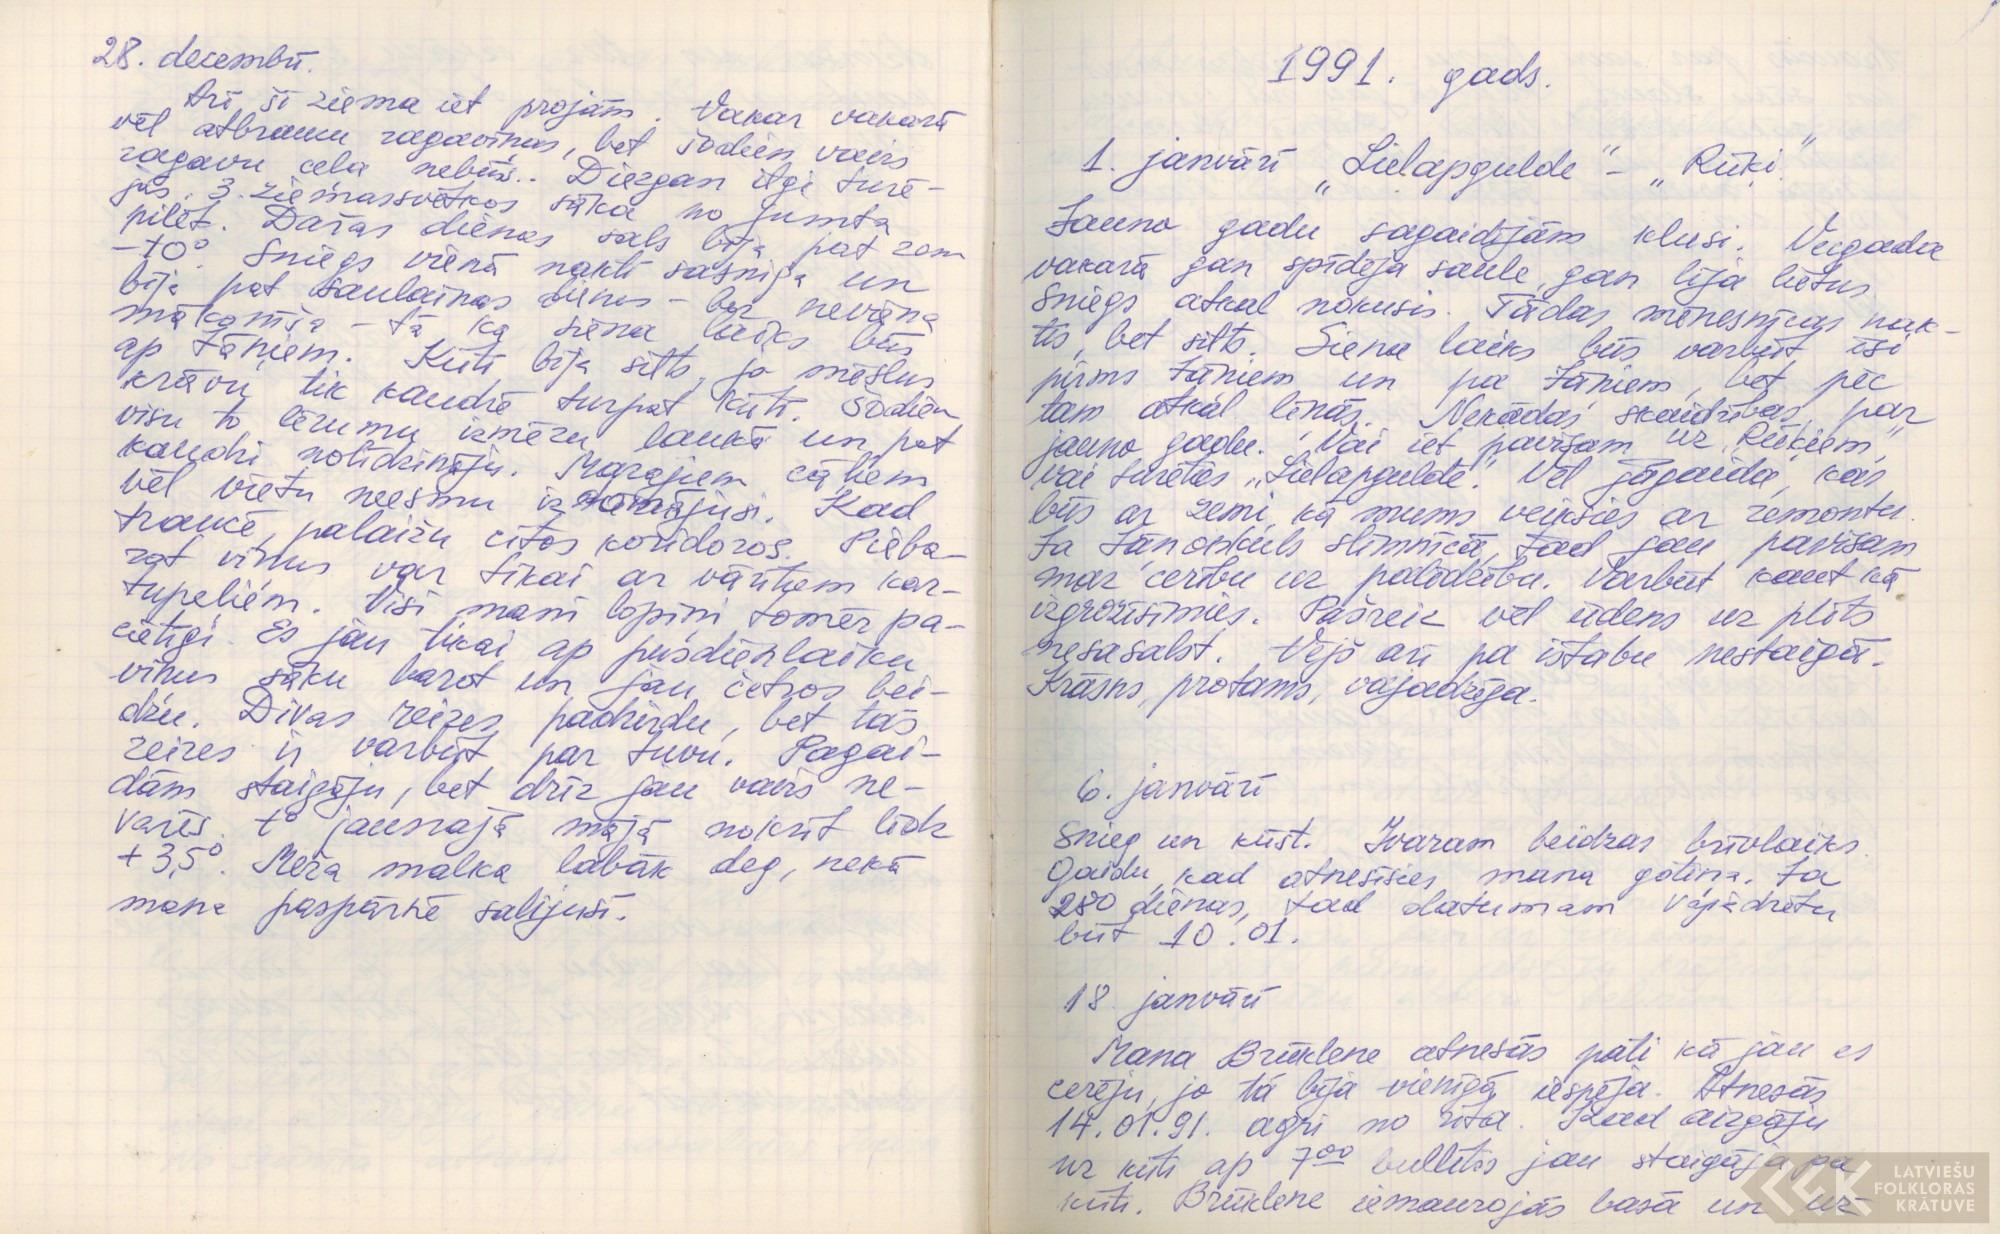 Ak161-Ligitas-Vucenas-dienasgramatas-28-0032